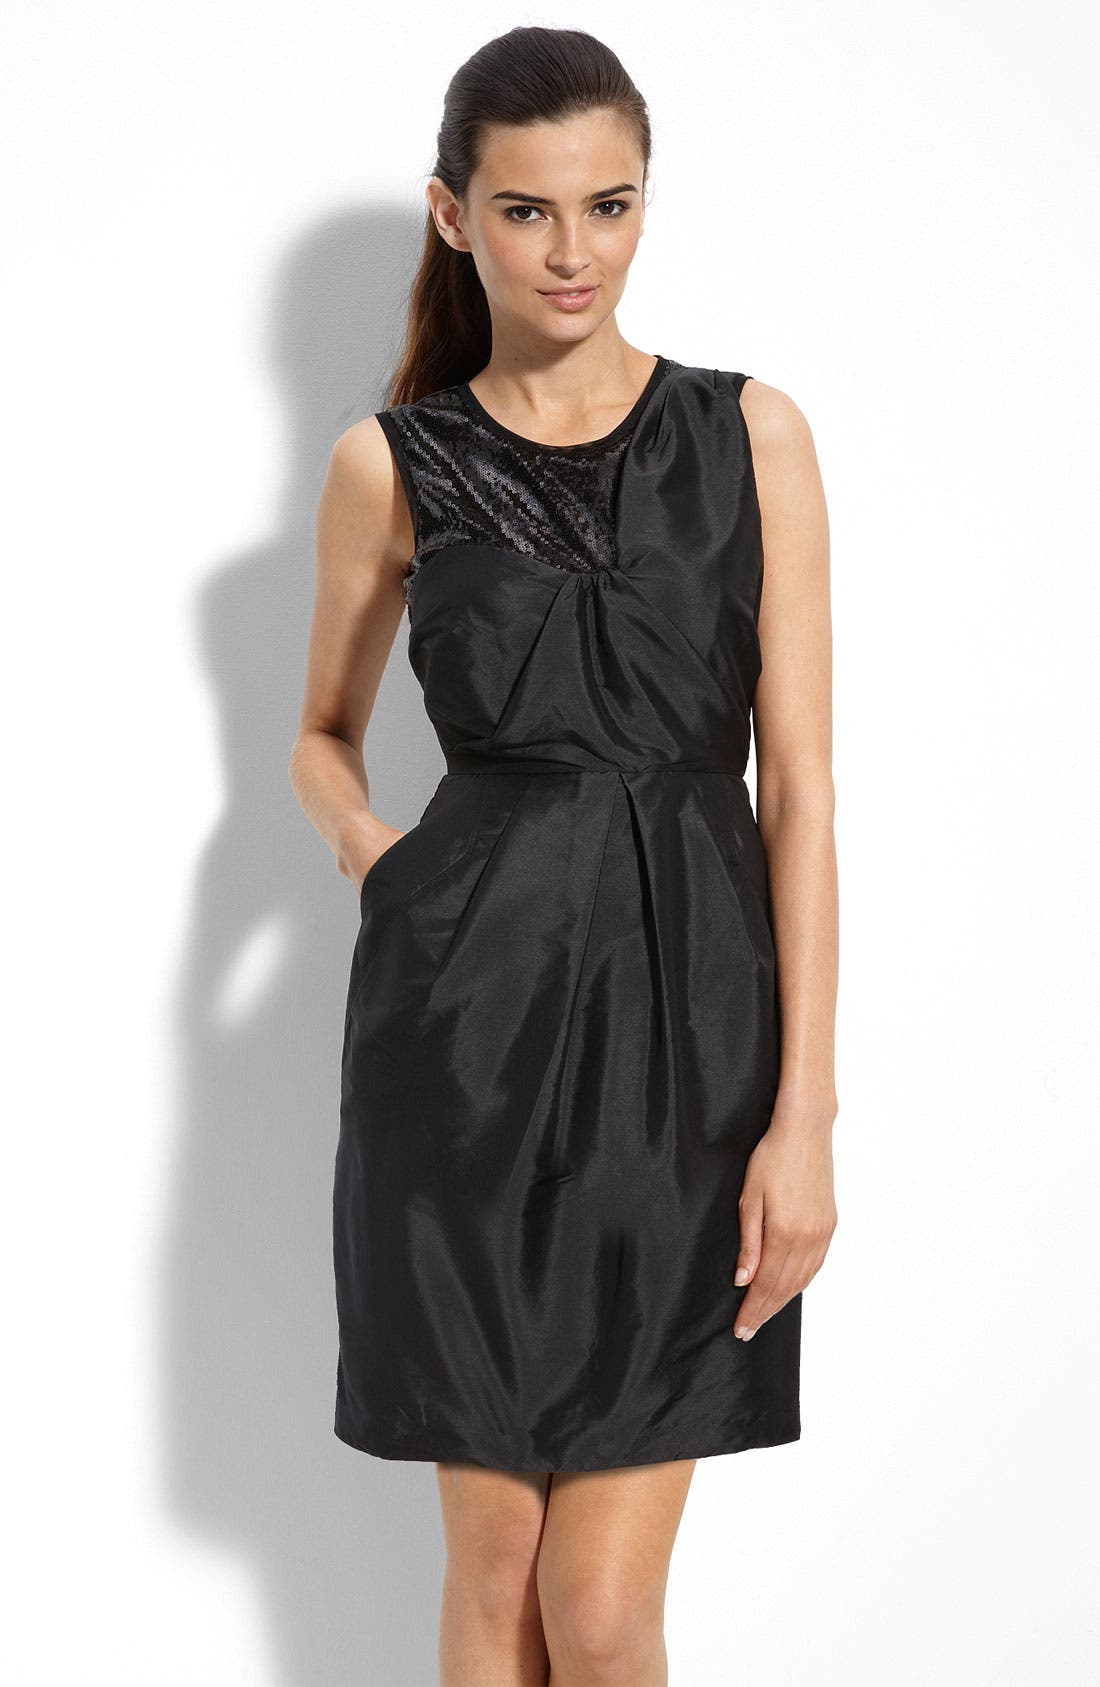 Alternate Image 1 Selected - Alexia Admor Sequin Trim Taffeta Sheath Dress